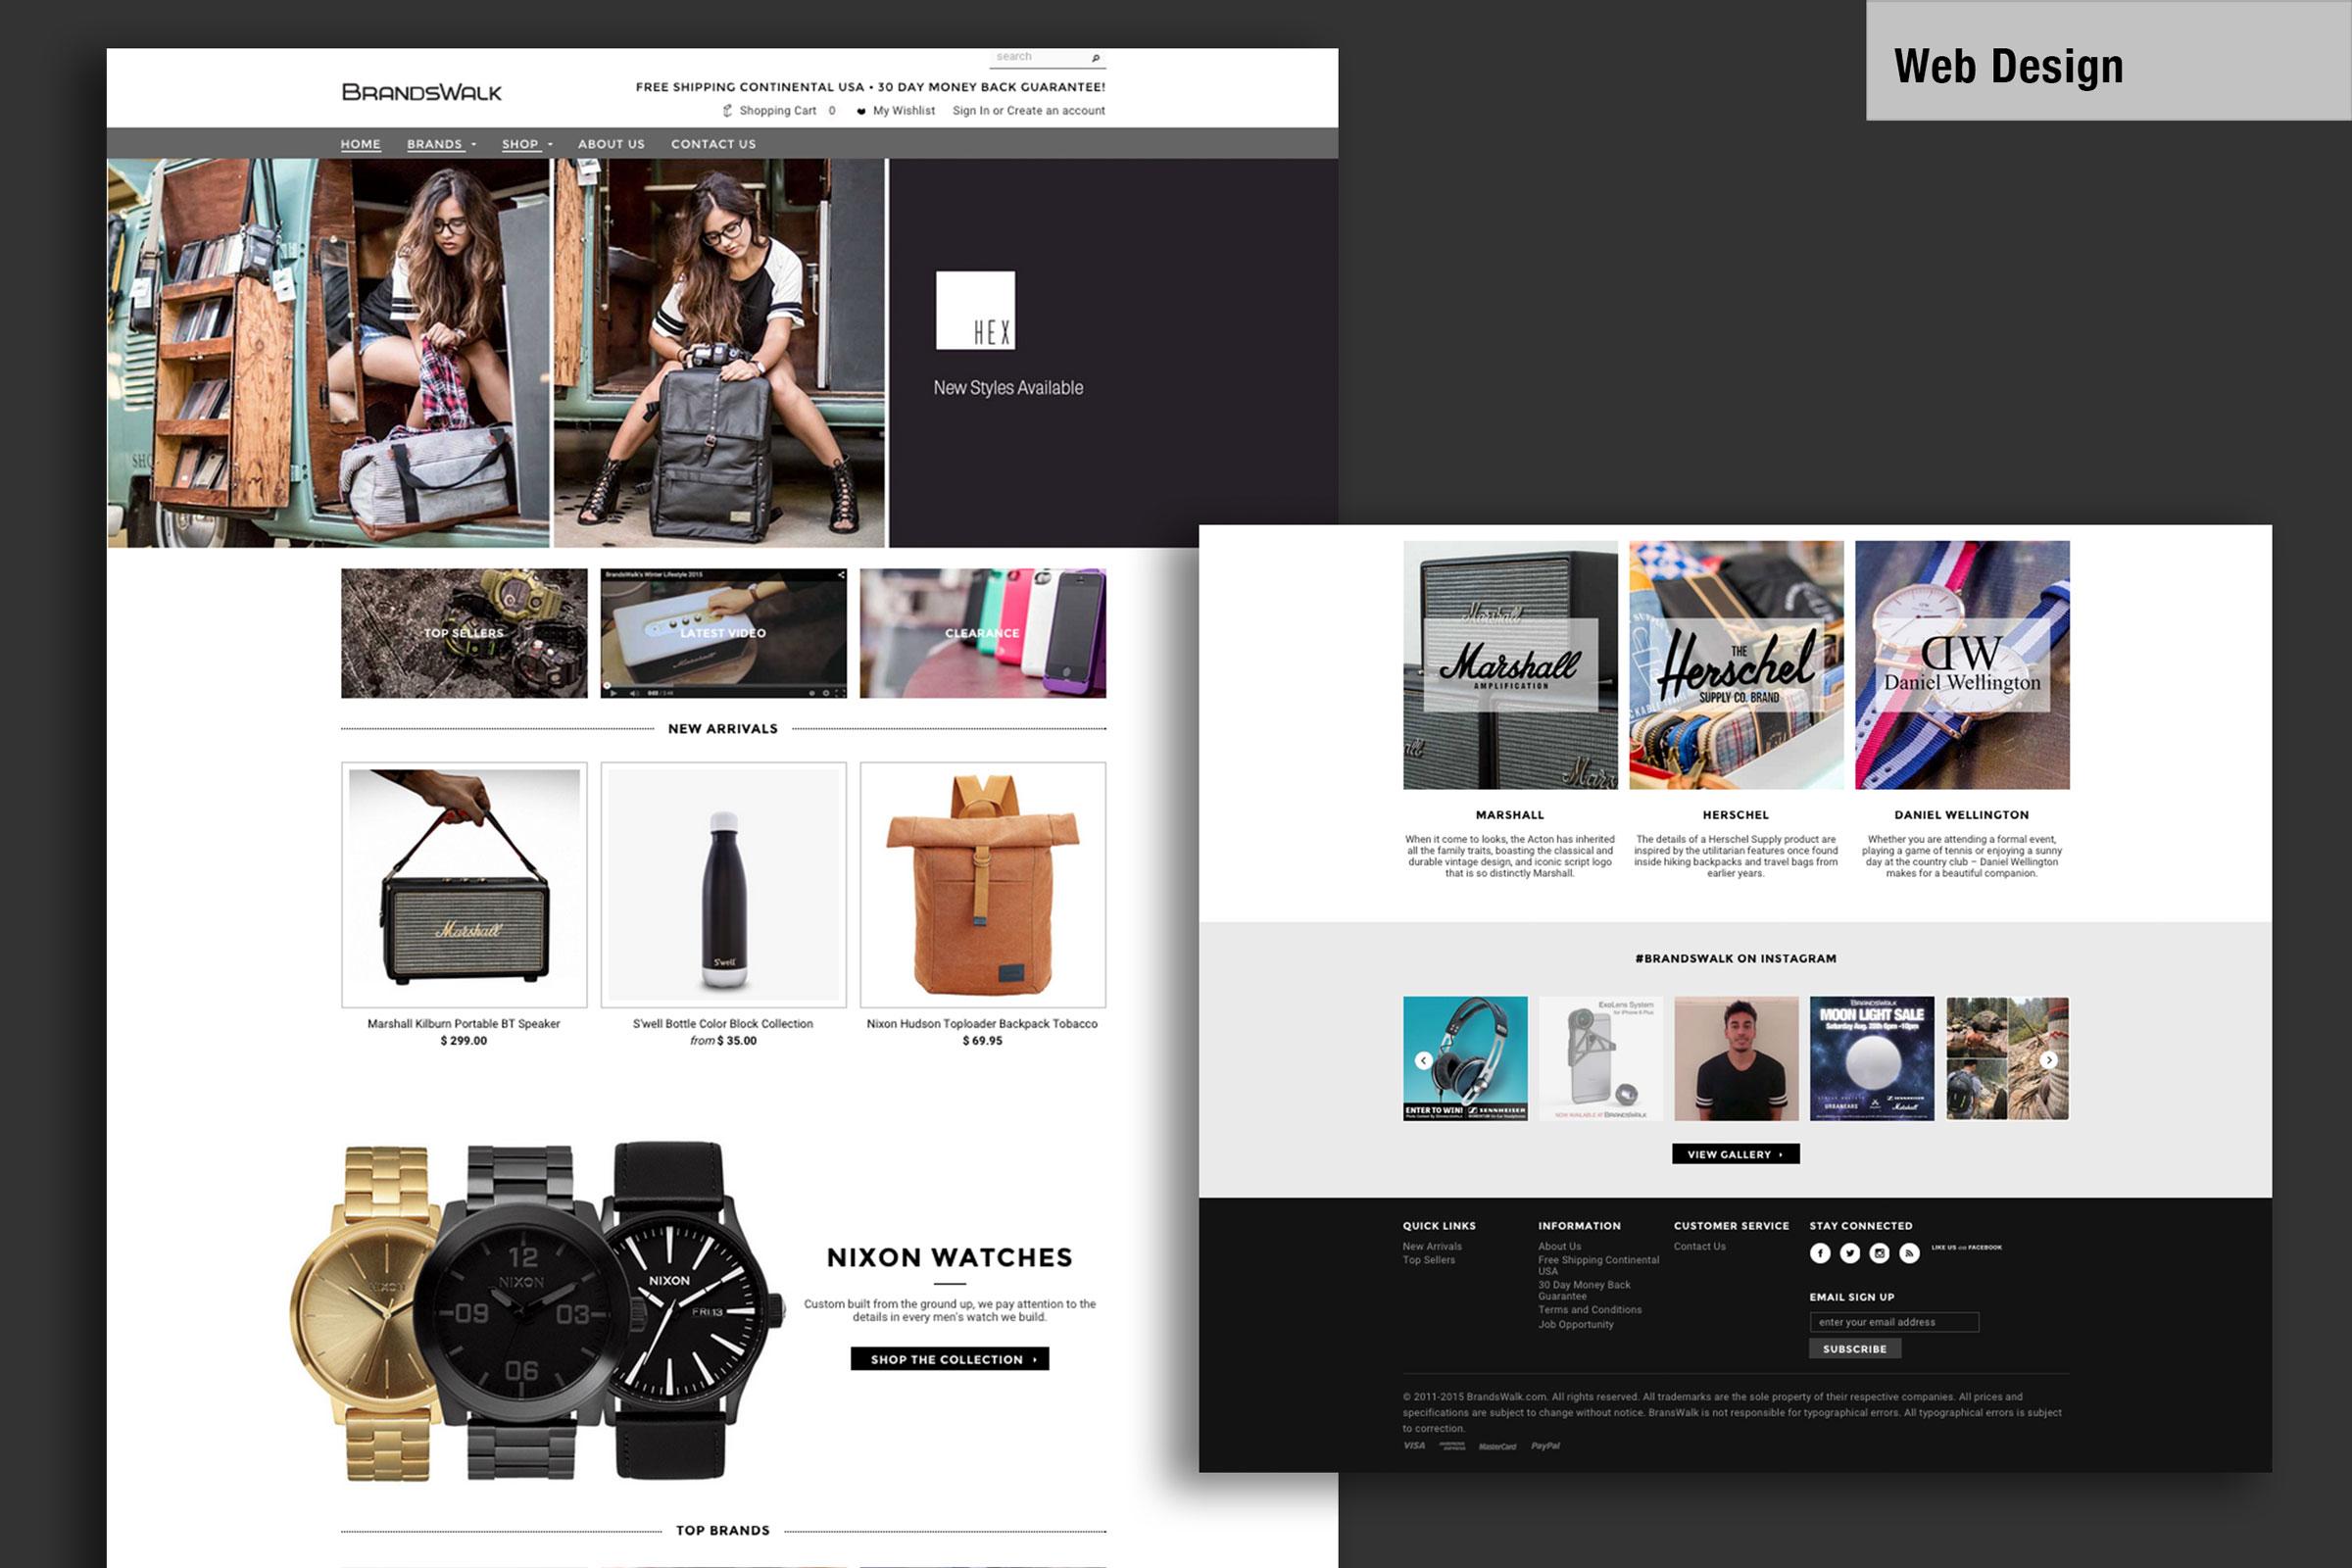 Project   Branding / Web Design   Media Assets   Website design and integration to Shopify